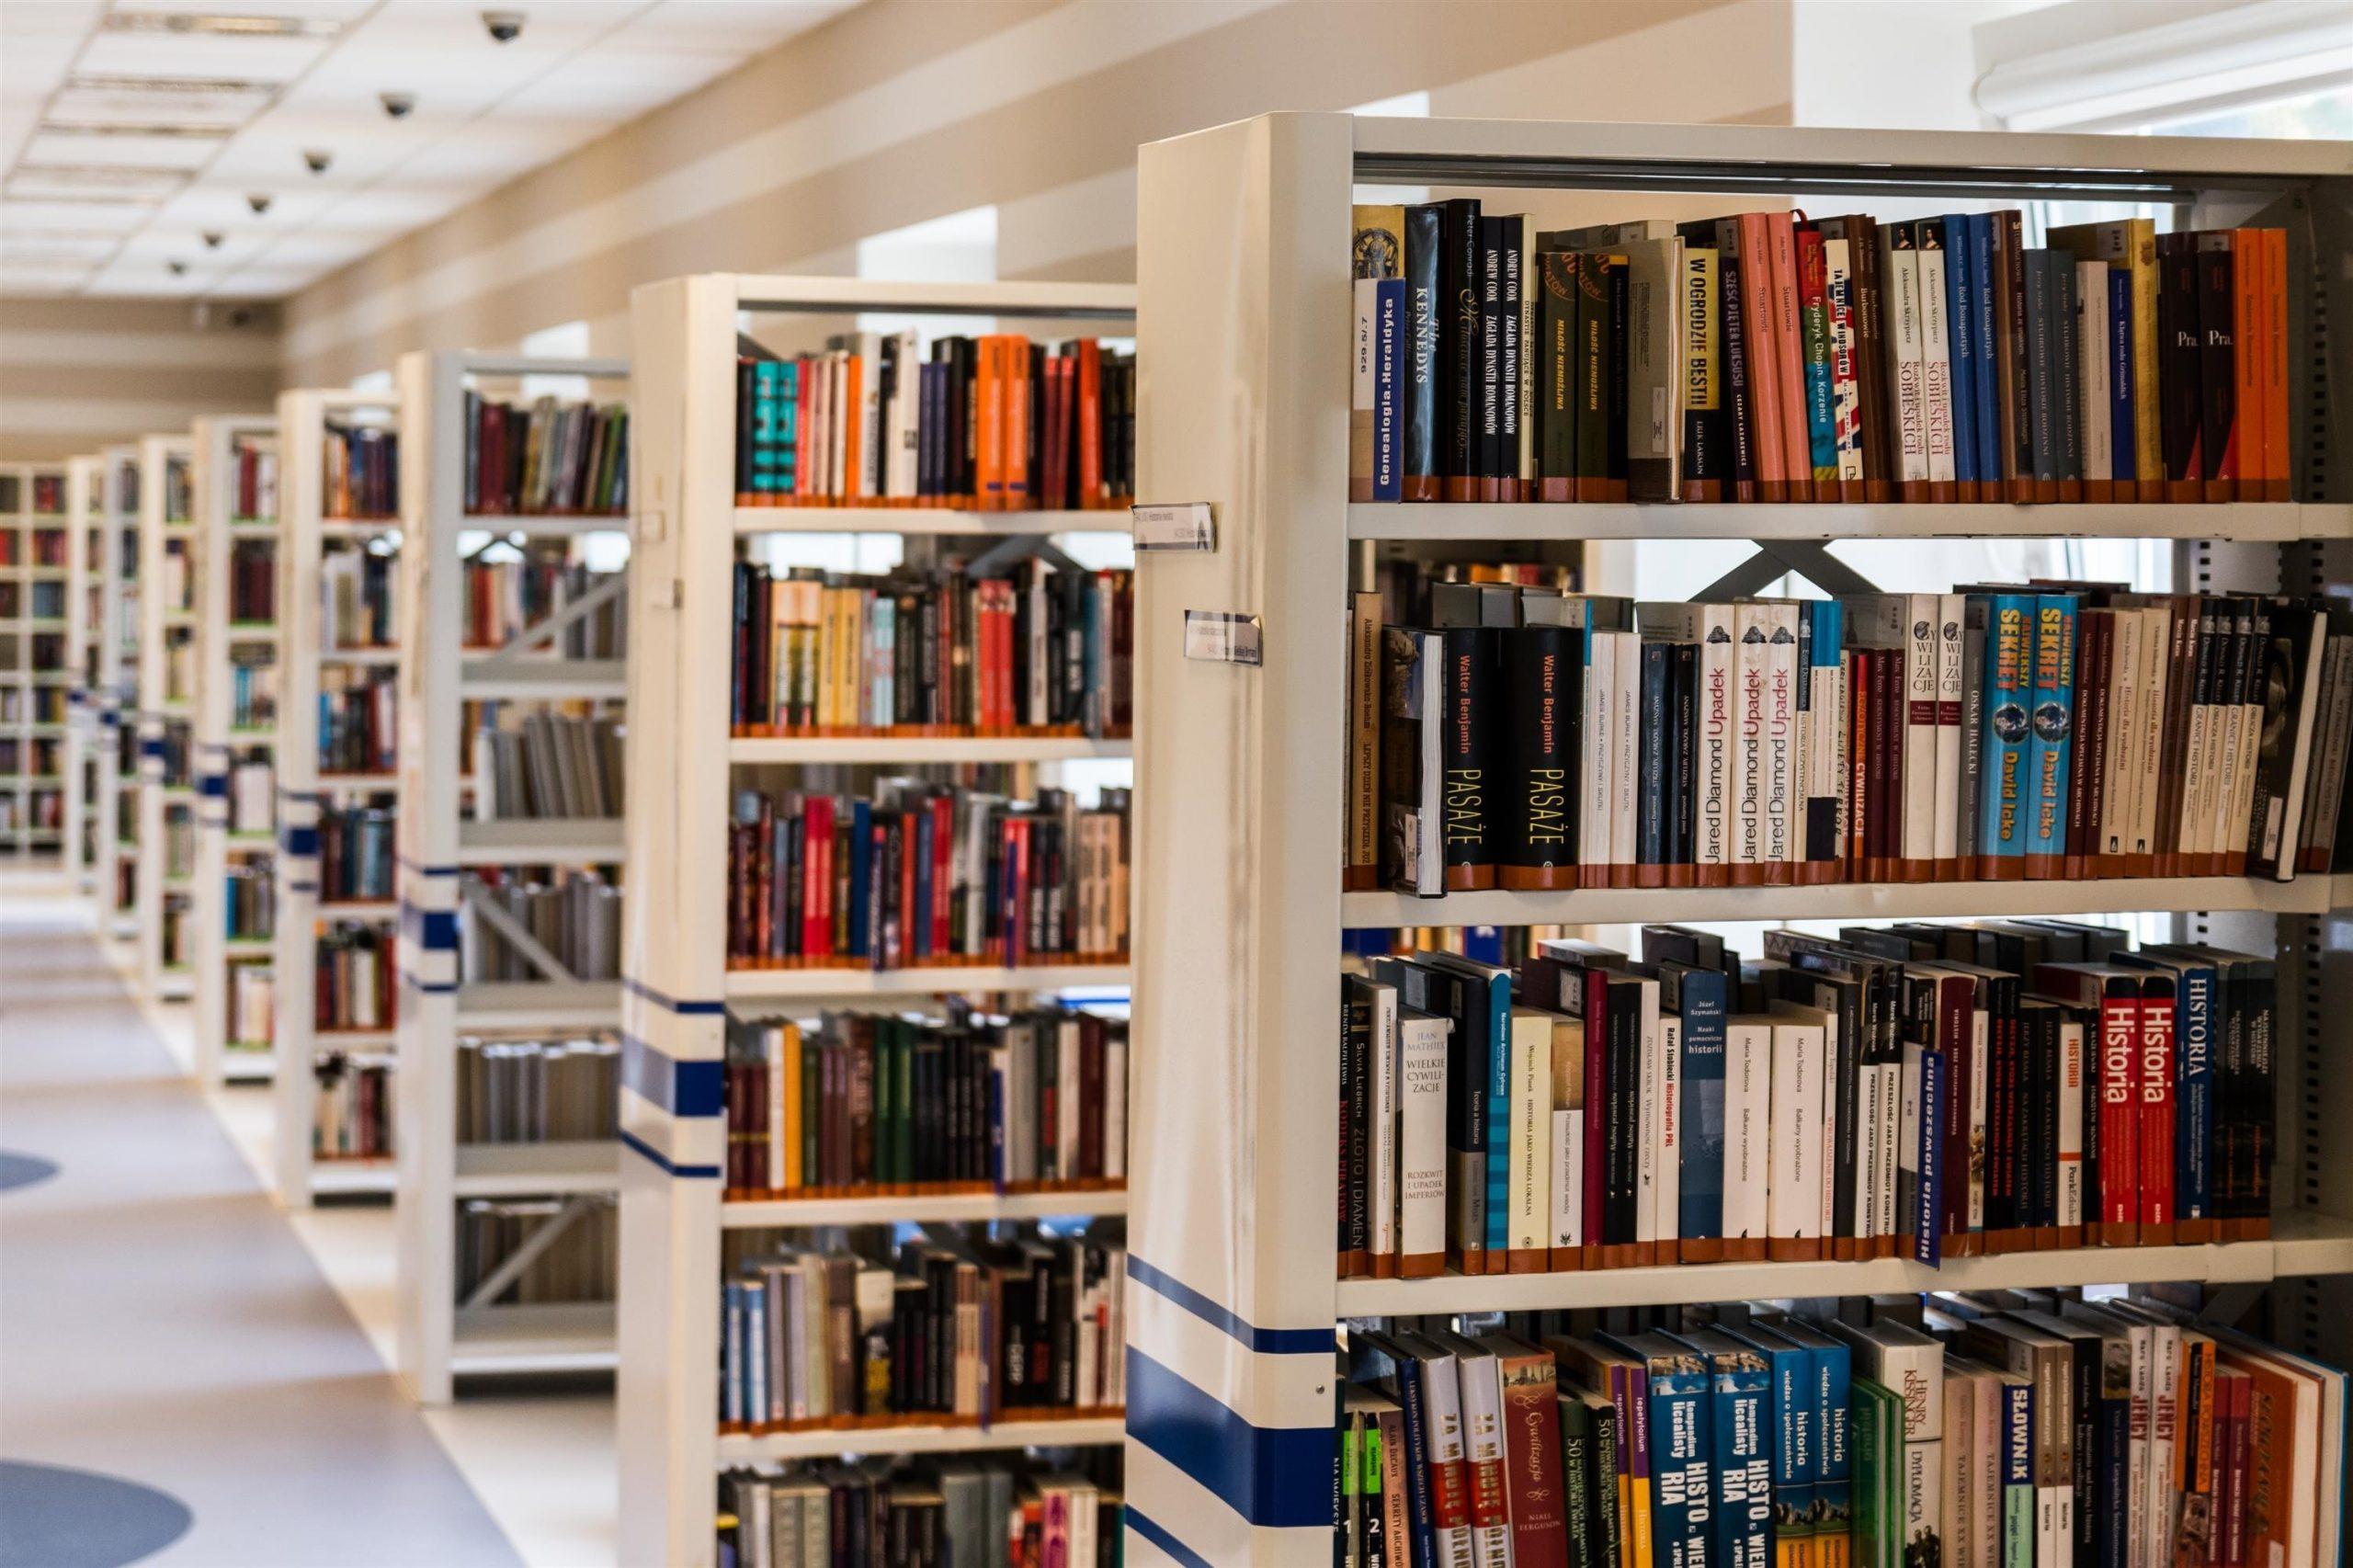 row-of-books-in-shelf-256541